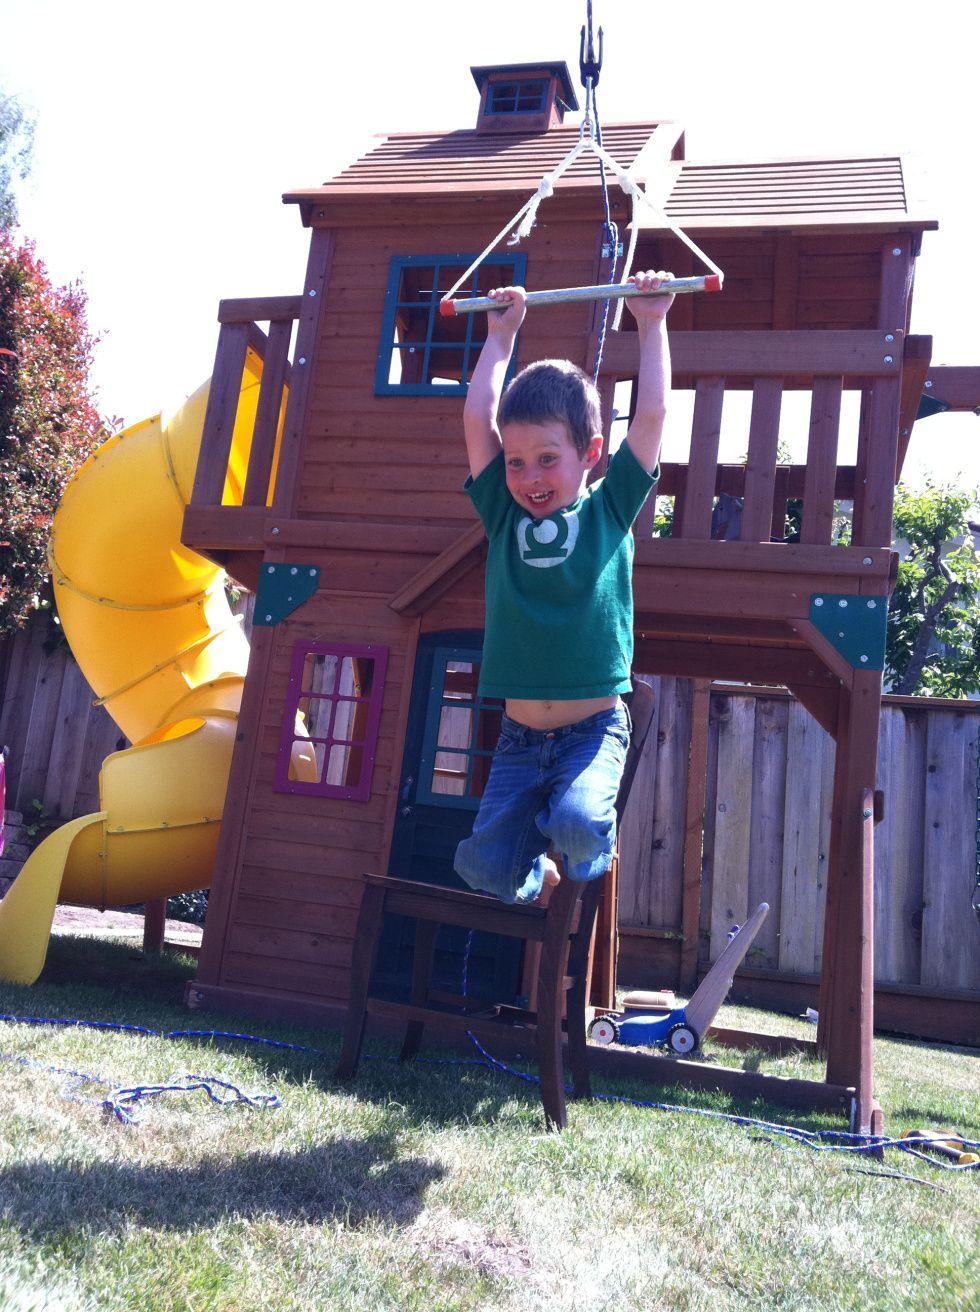 DIY Dorkdad | Zip line backyard